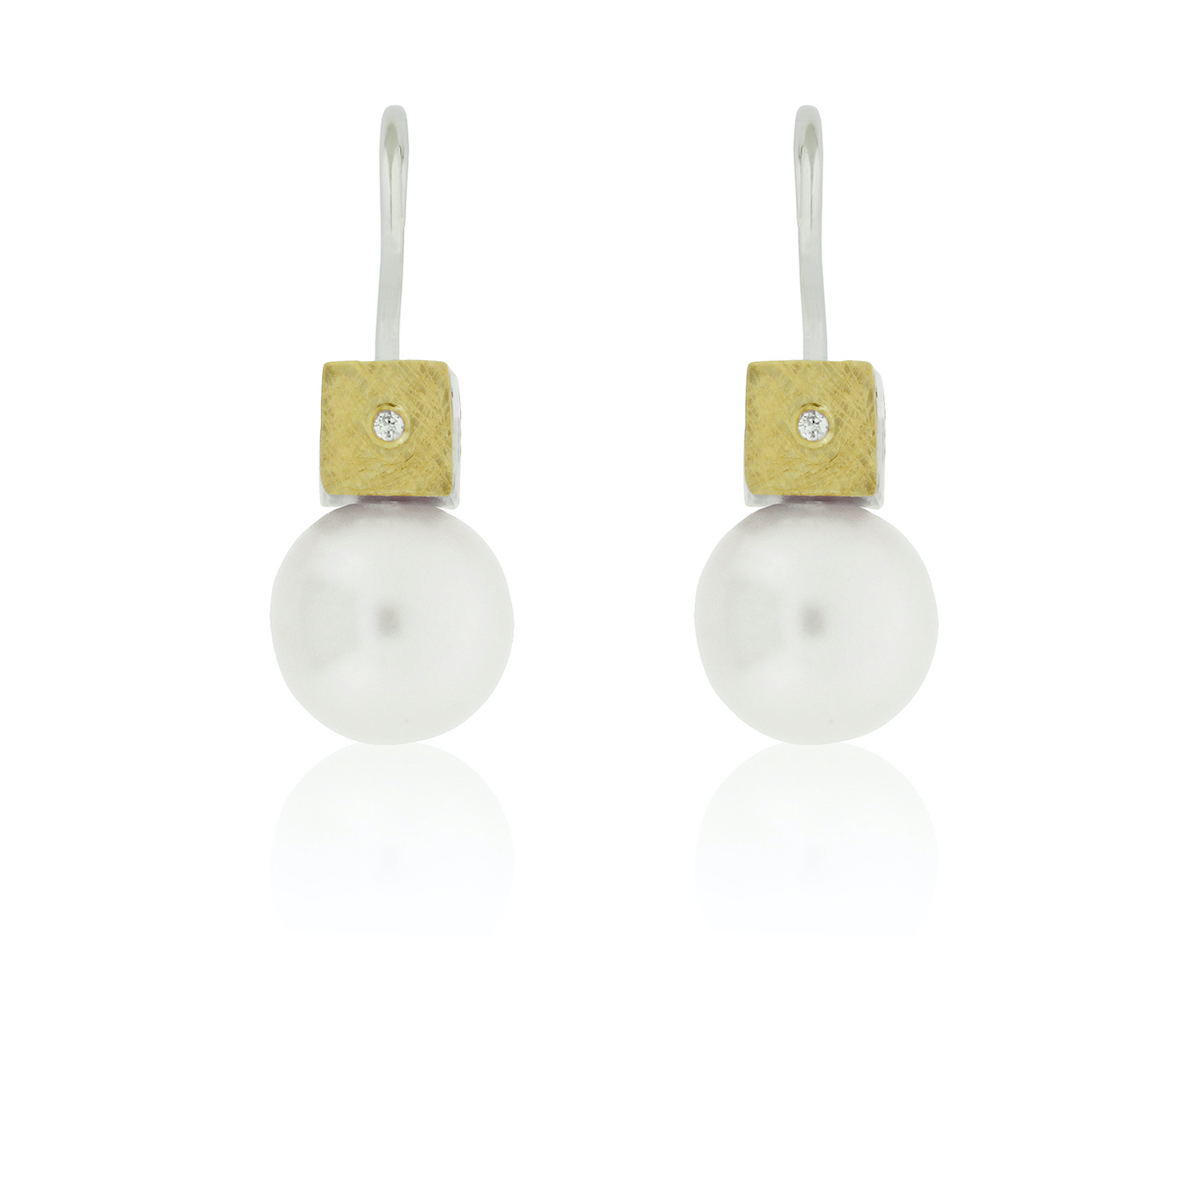 SILVER & GOLD EARRINGS w/ DIAMONDS & PEARL. E1744LD